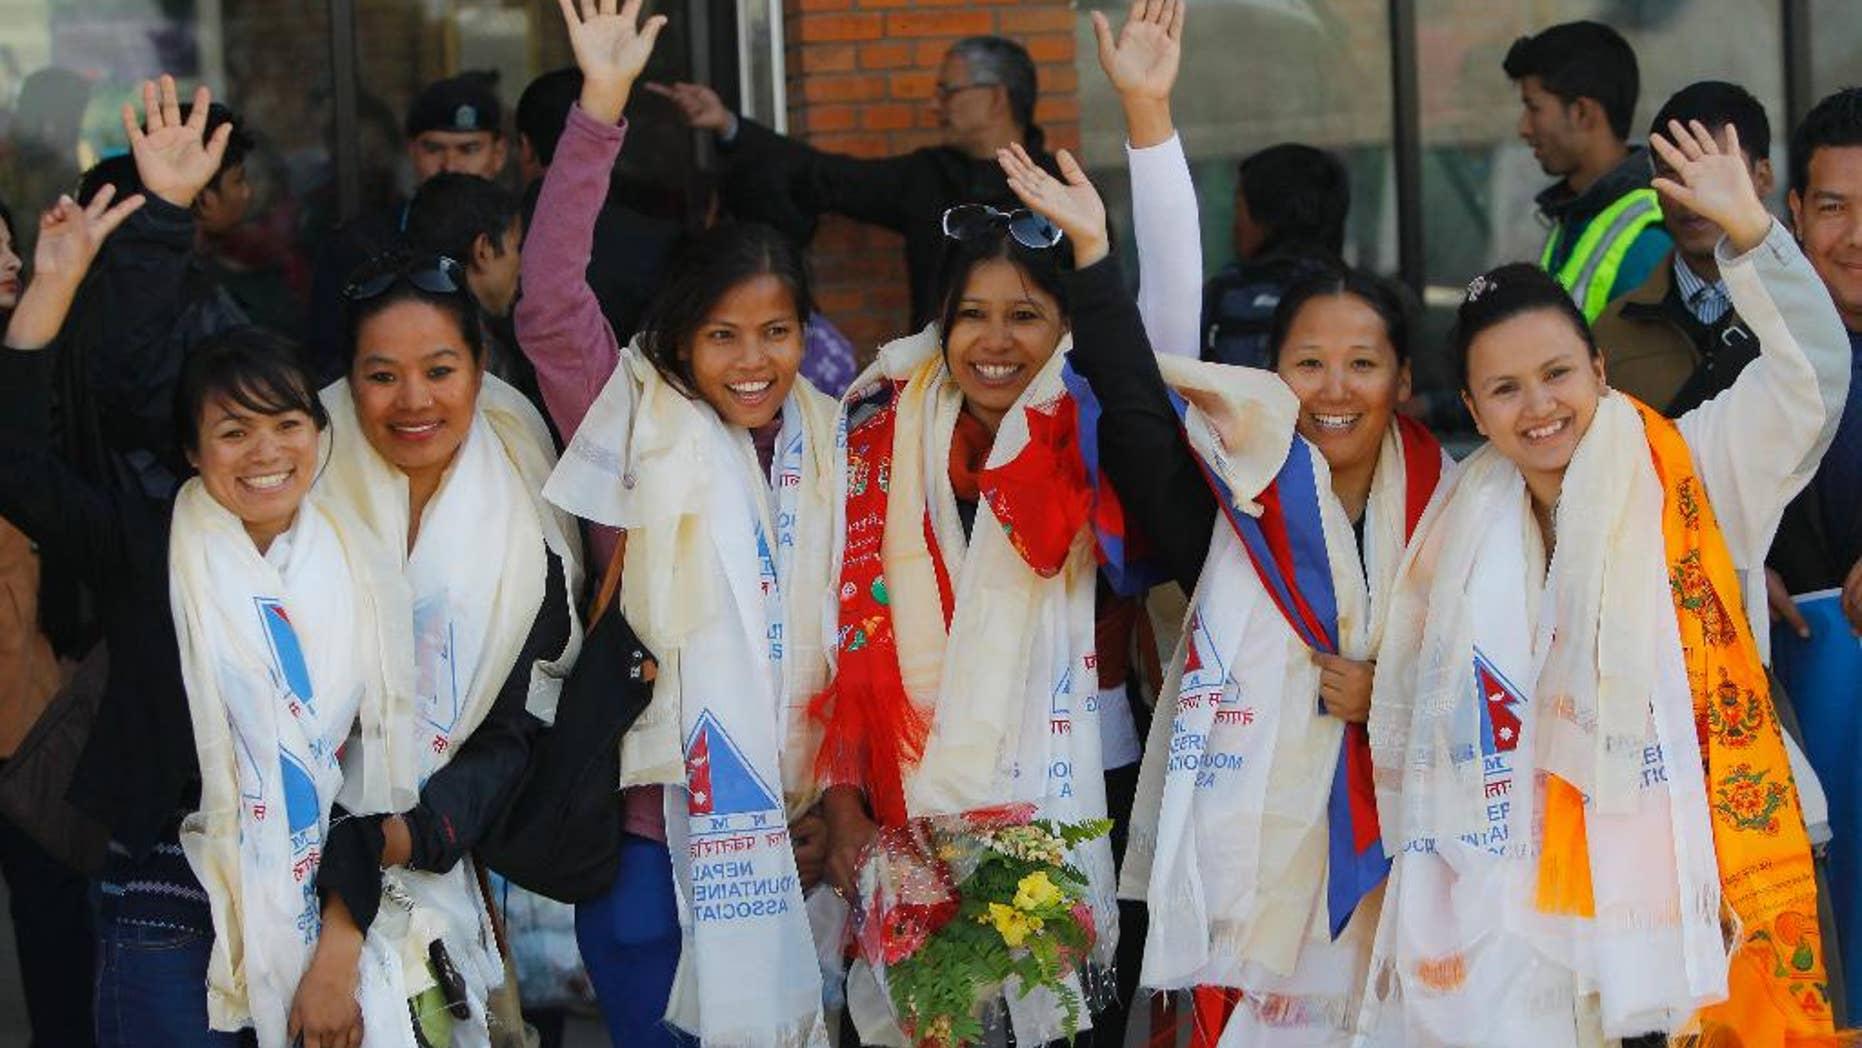 Jan. 9, 2015: From left to right: Nepalese climbers Nimdoma Sherpa, Maya Gurung, Asha Singh, Chunu Shrestha, Pema Dikki and Shailee Basnet pose for the media at the Tribhuwan International Airport, Kathmandu.